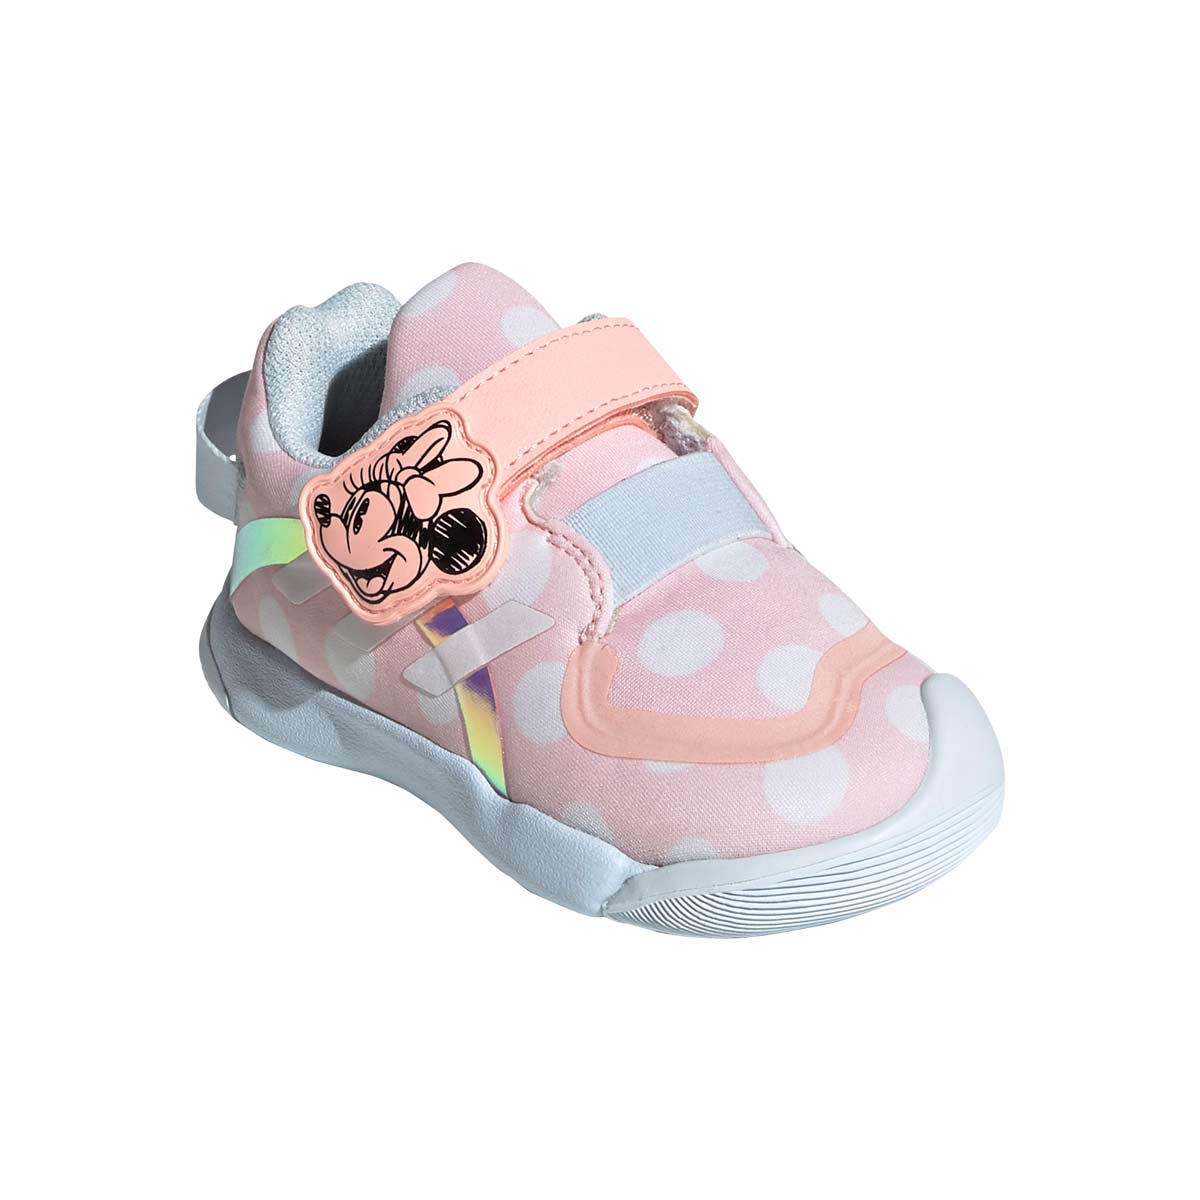 Tenis-Infantil-Adidas-ActivePlay-Disney-Minnie--18-ao-25-